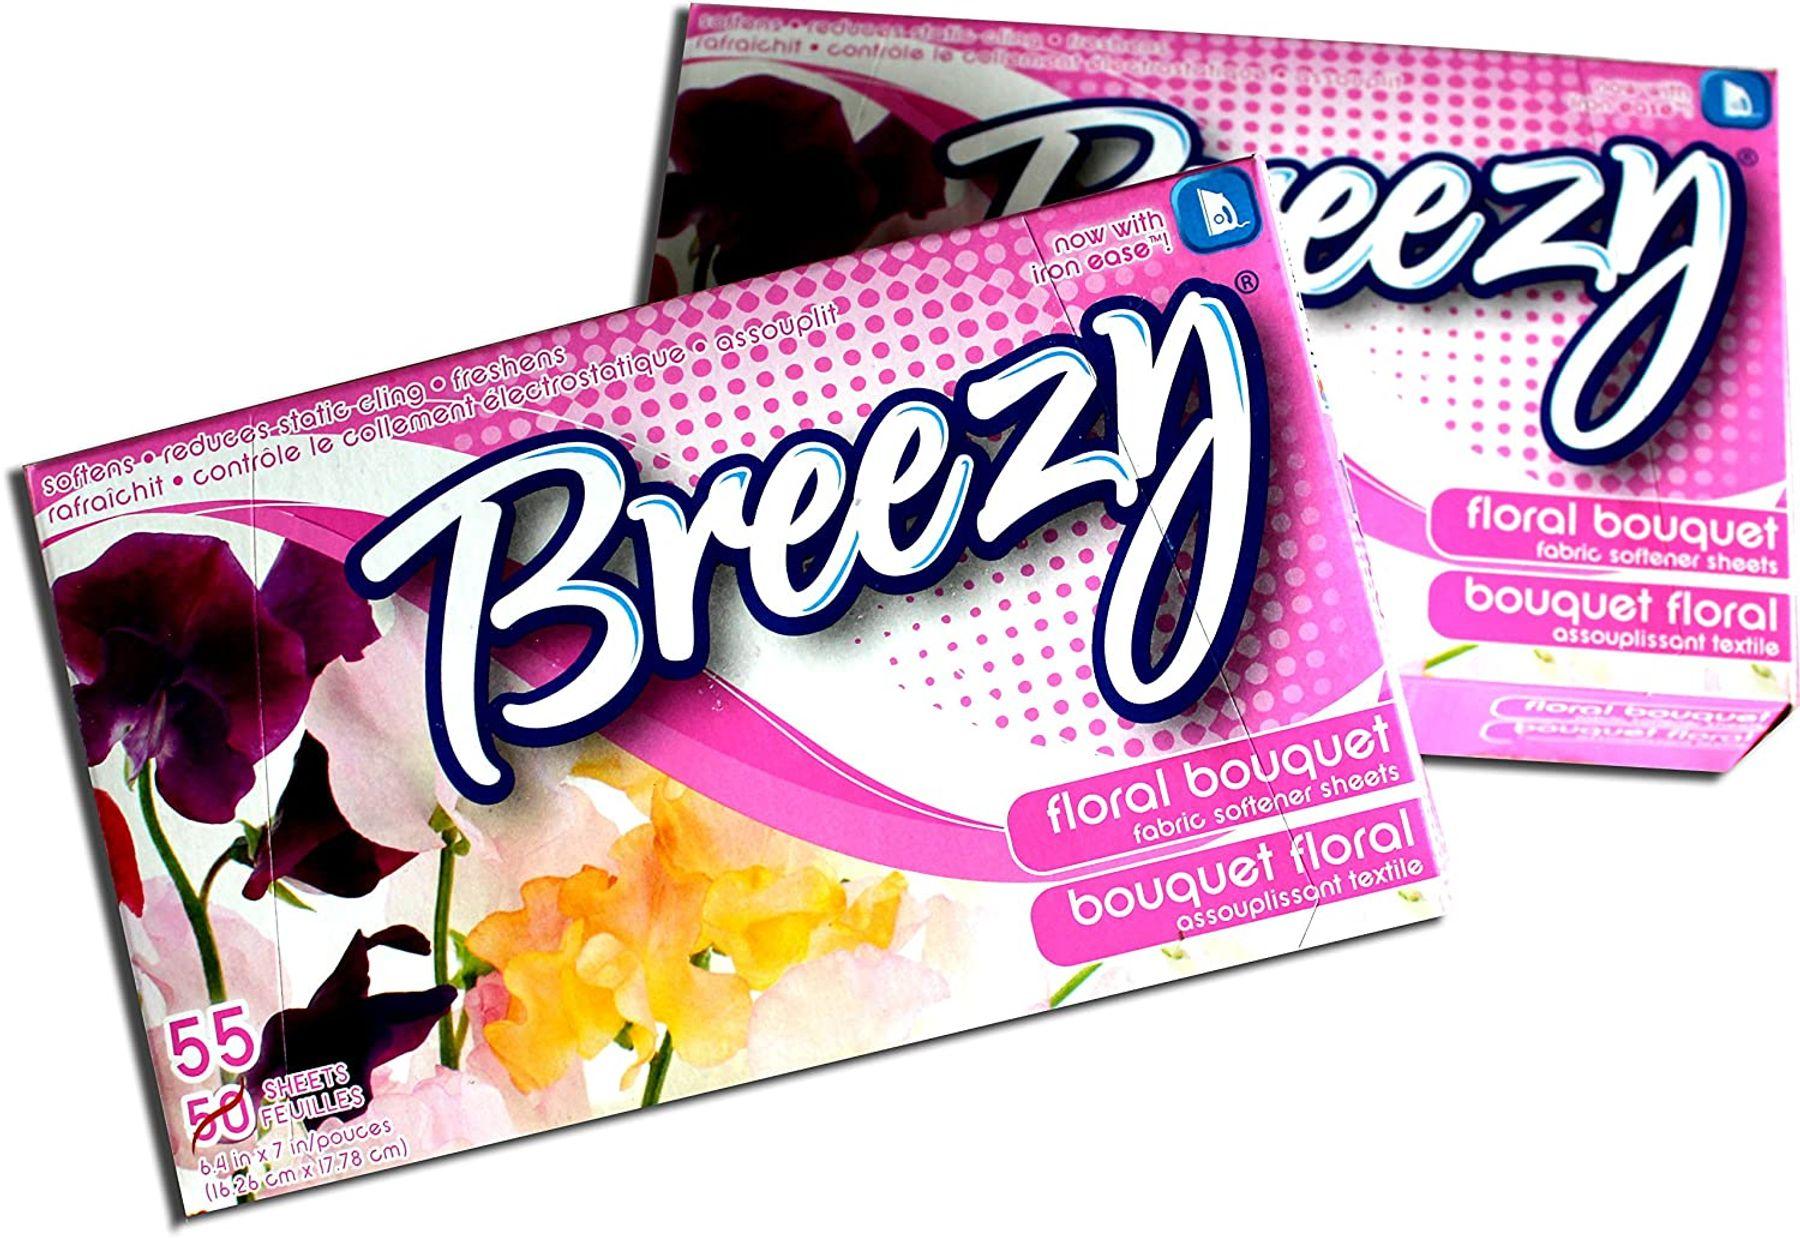 Giấy thơm quần áo Breezy